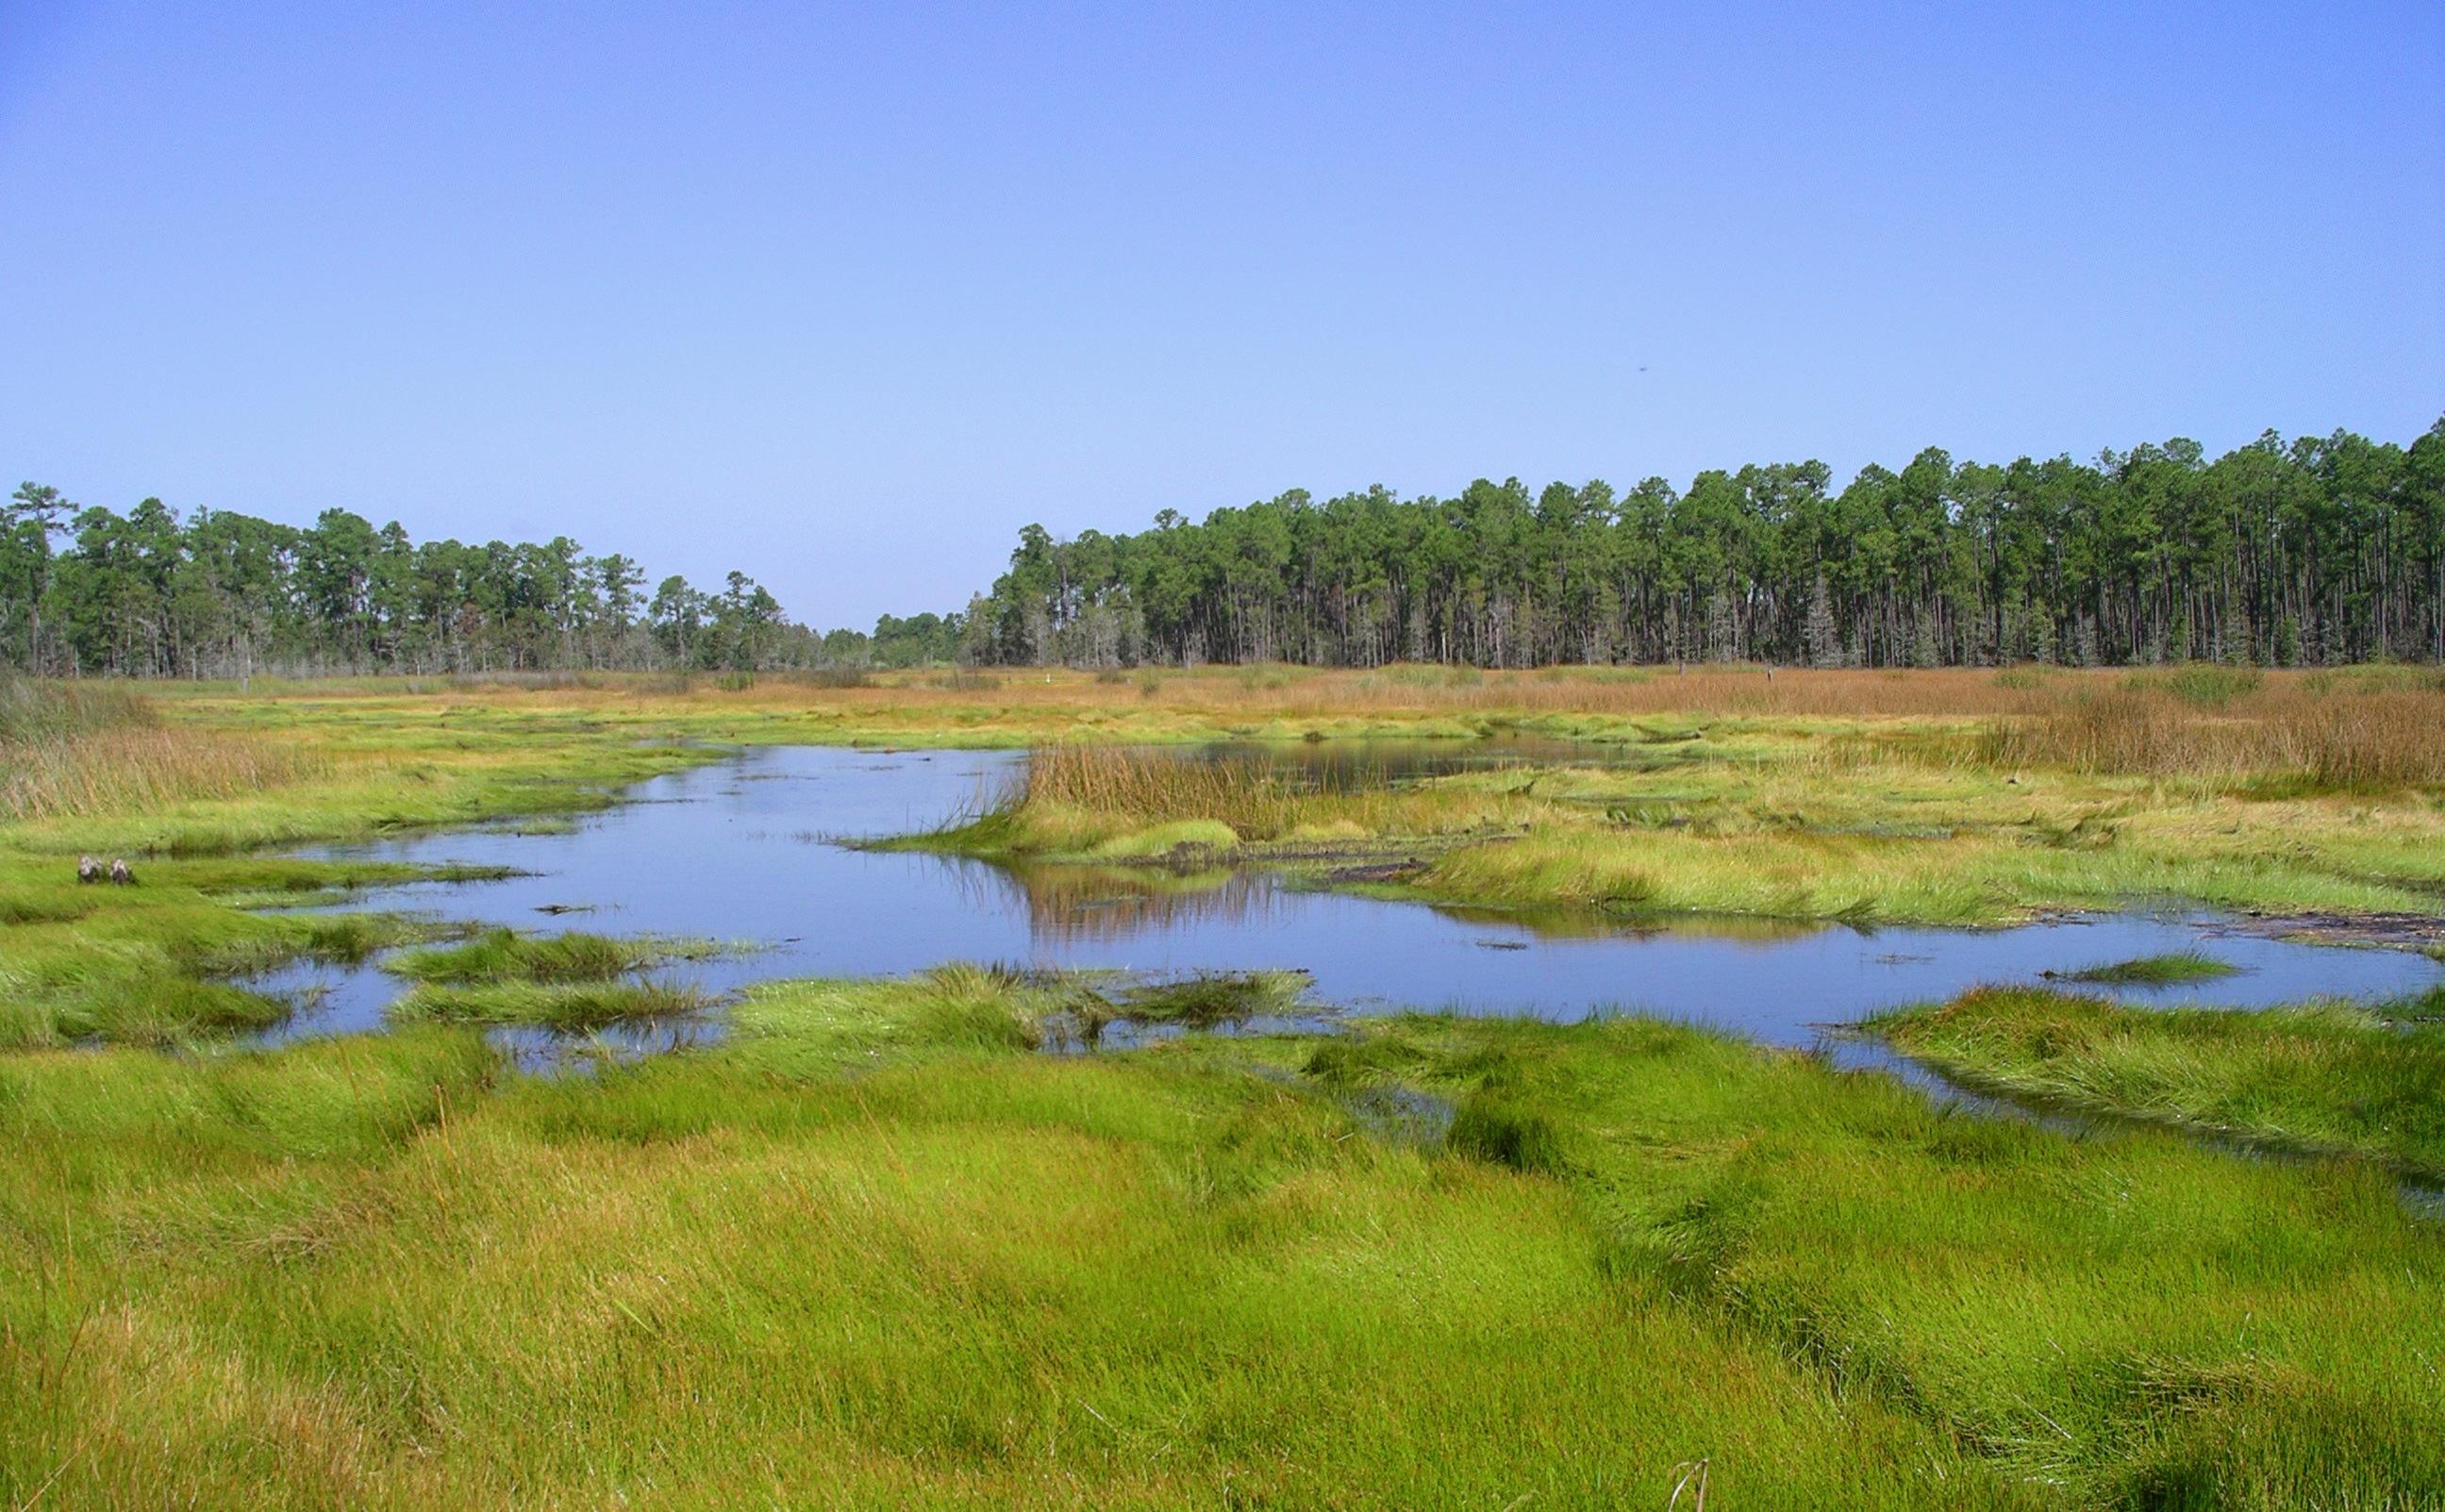 Grand Bay National Estuarine Research Reserve landscape.